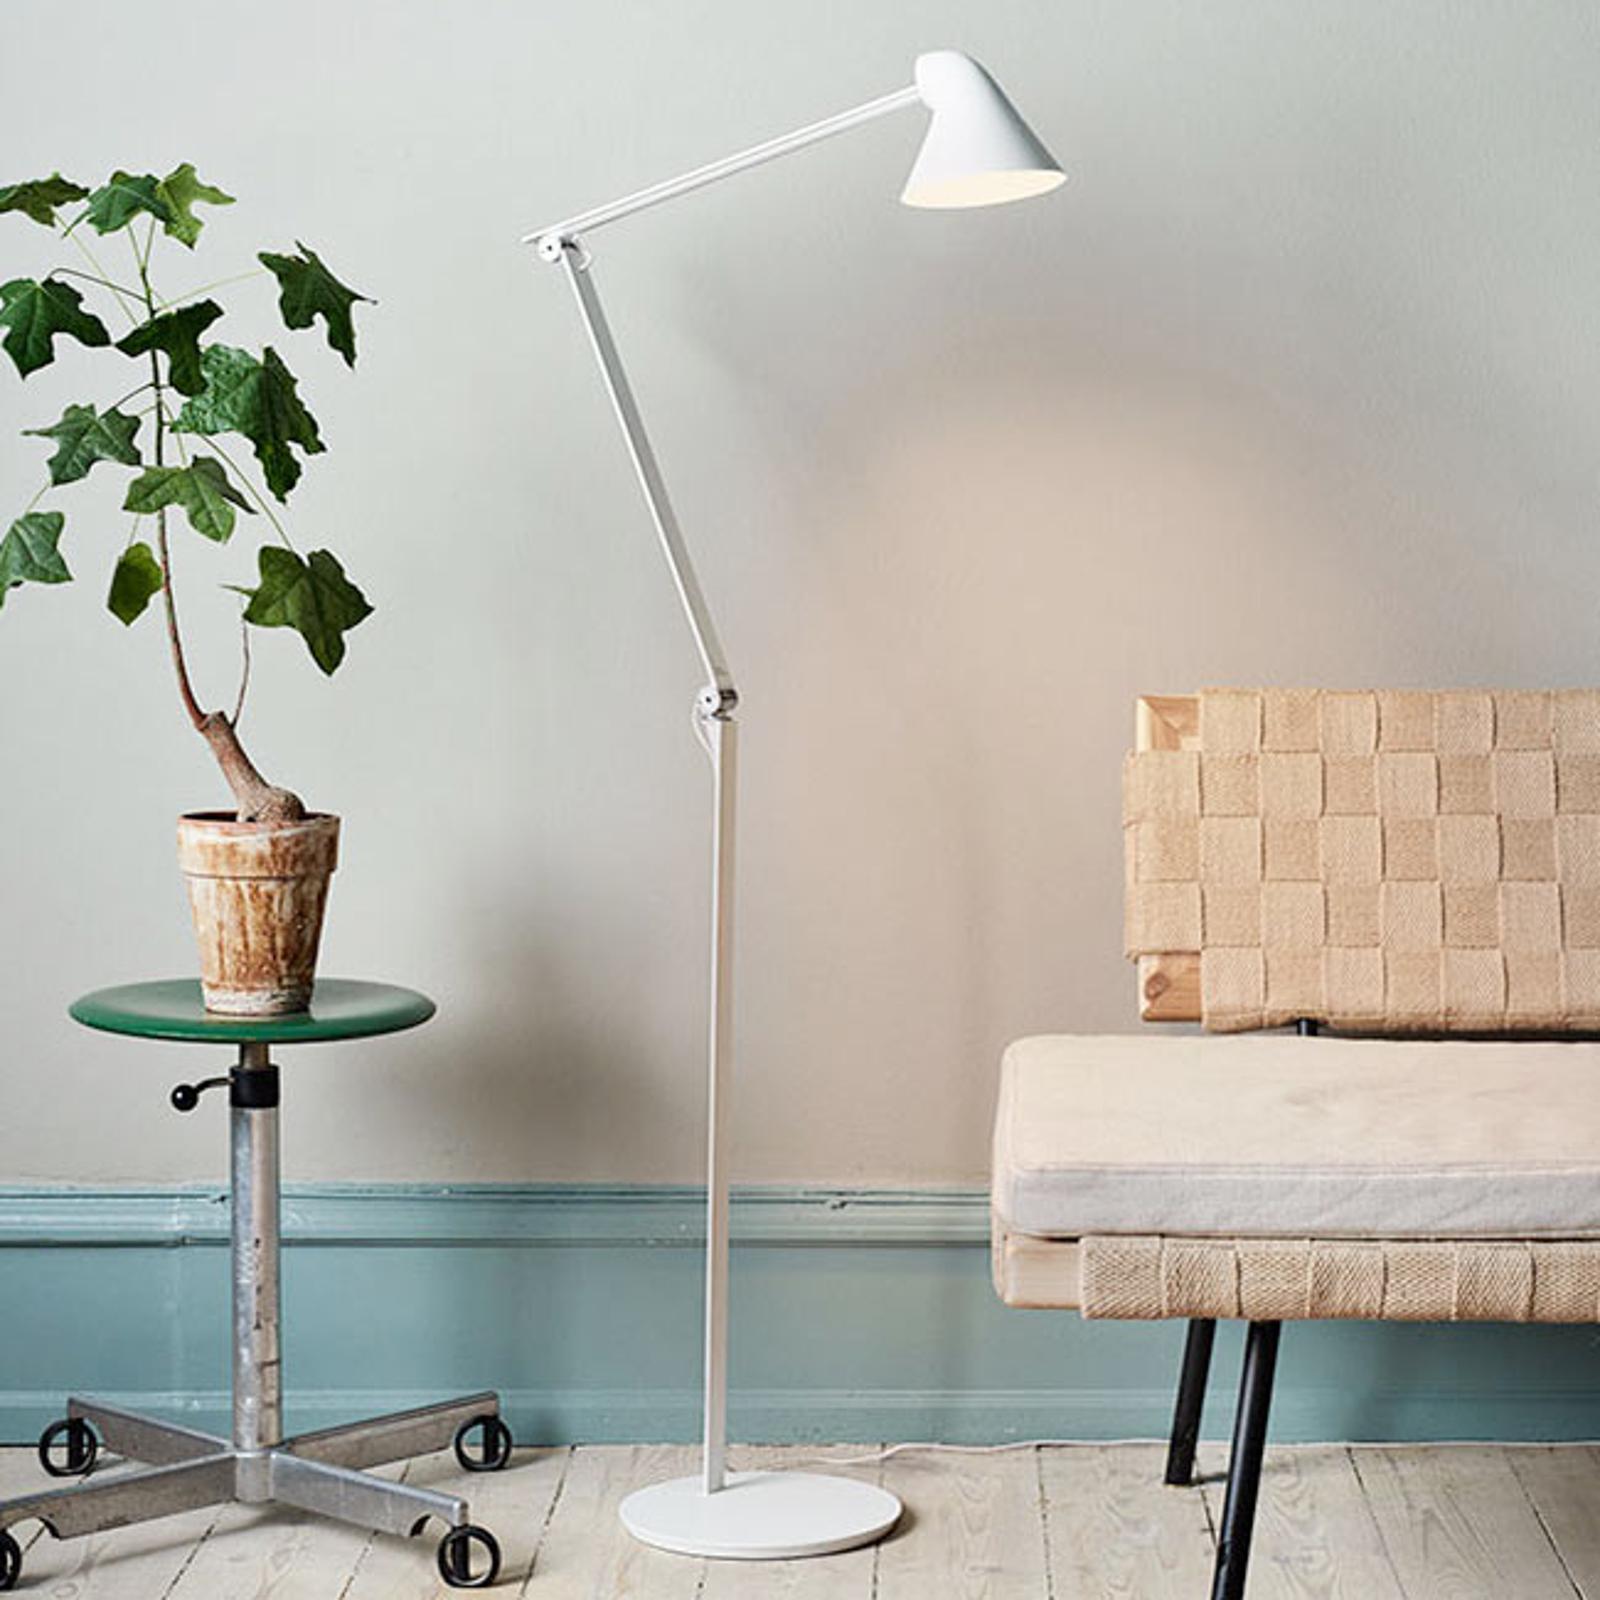 Louis Poulsen NJP LED-Stehleuchte 2.700 K weiß